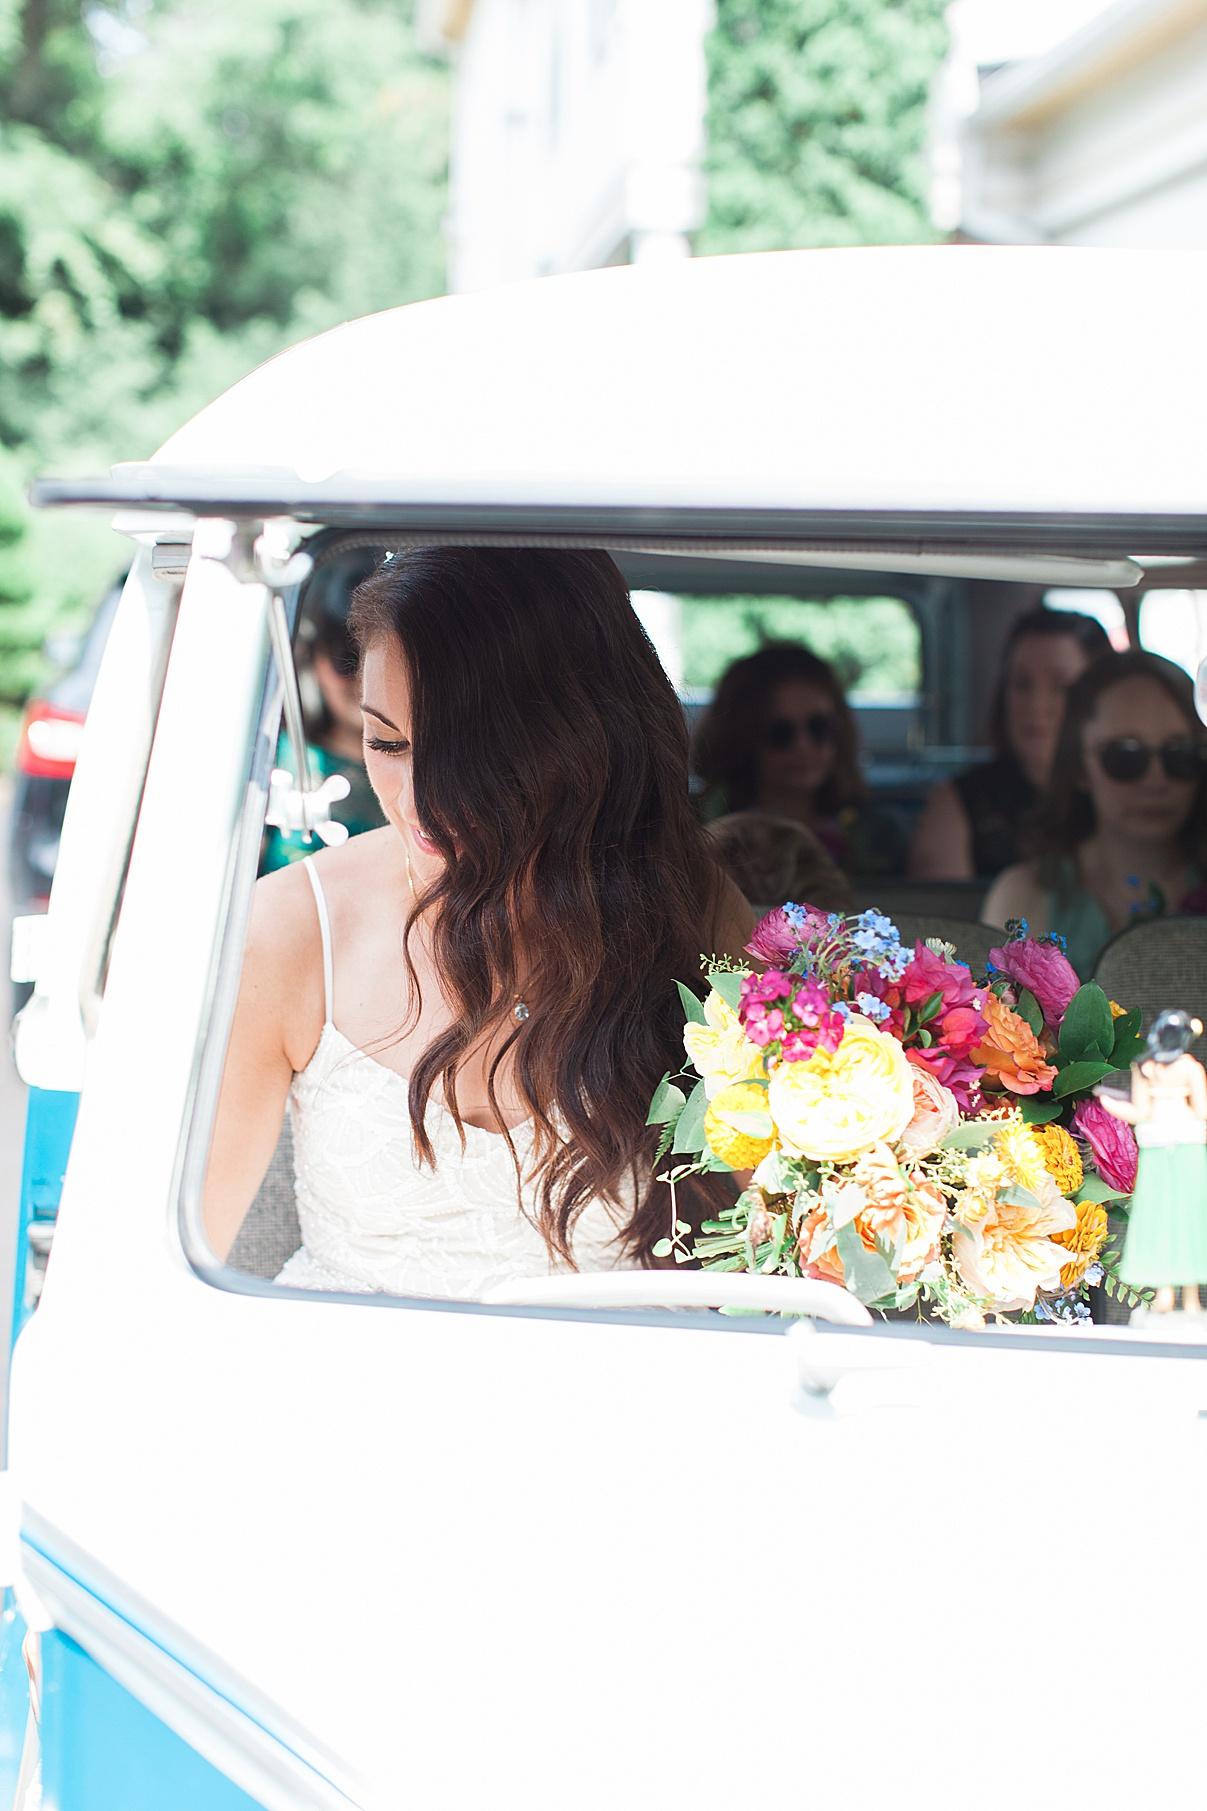 Bride and bridesmaids in retro bus | Balls Falls, Ontario Wedding| Ontario Wedding Photographer| Toronto Wedding Photographer| 3Photography|3photography.ca